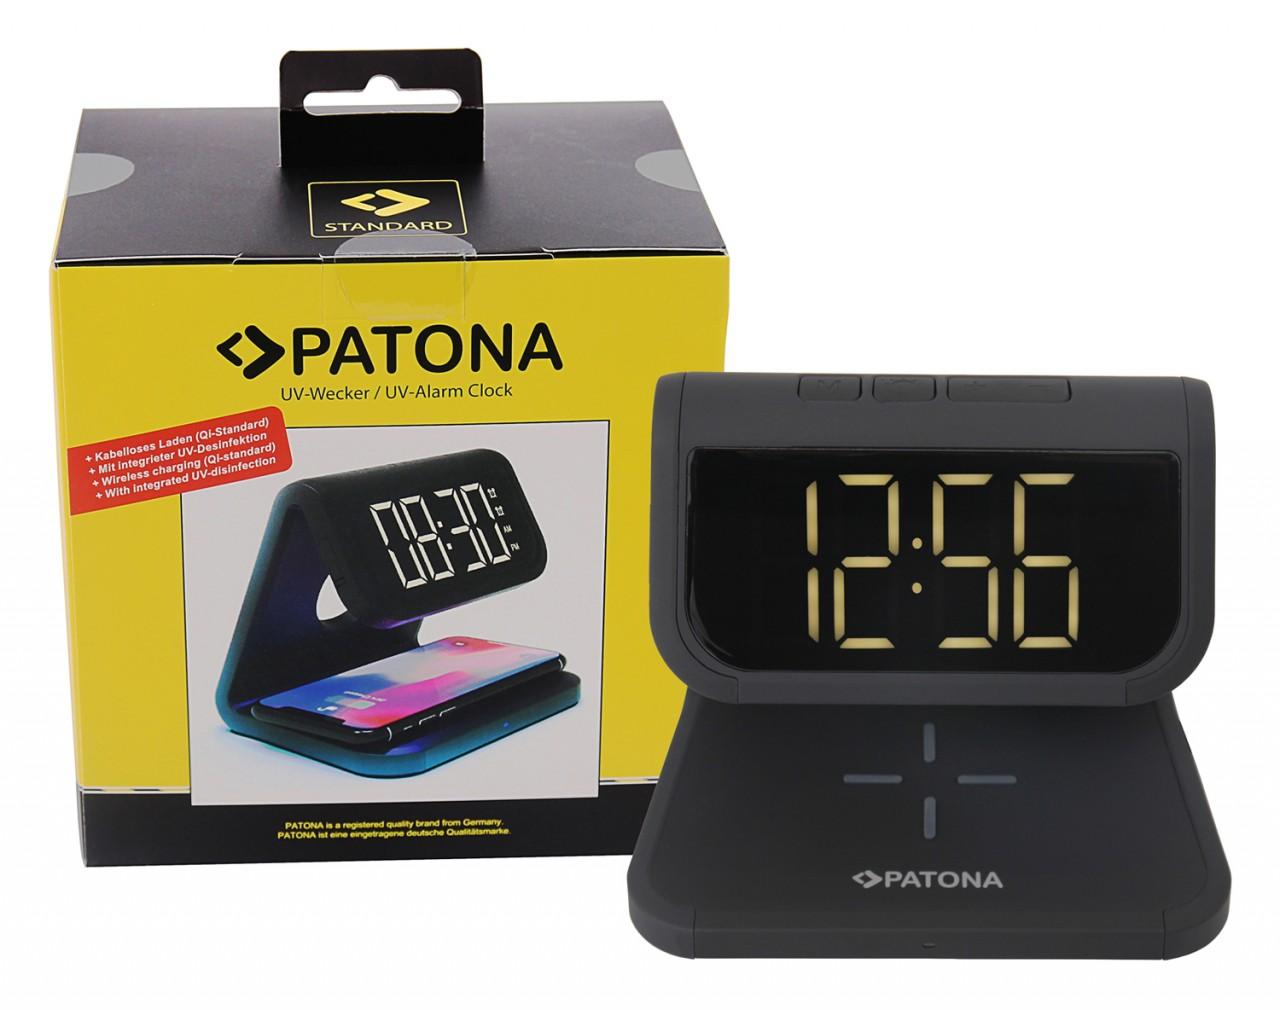 PATONA Alarm clock with LCD display wireless charging functi